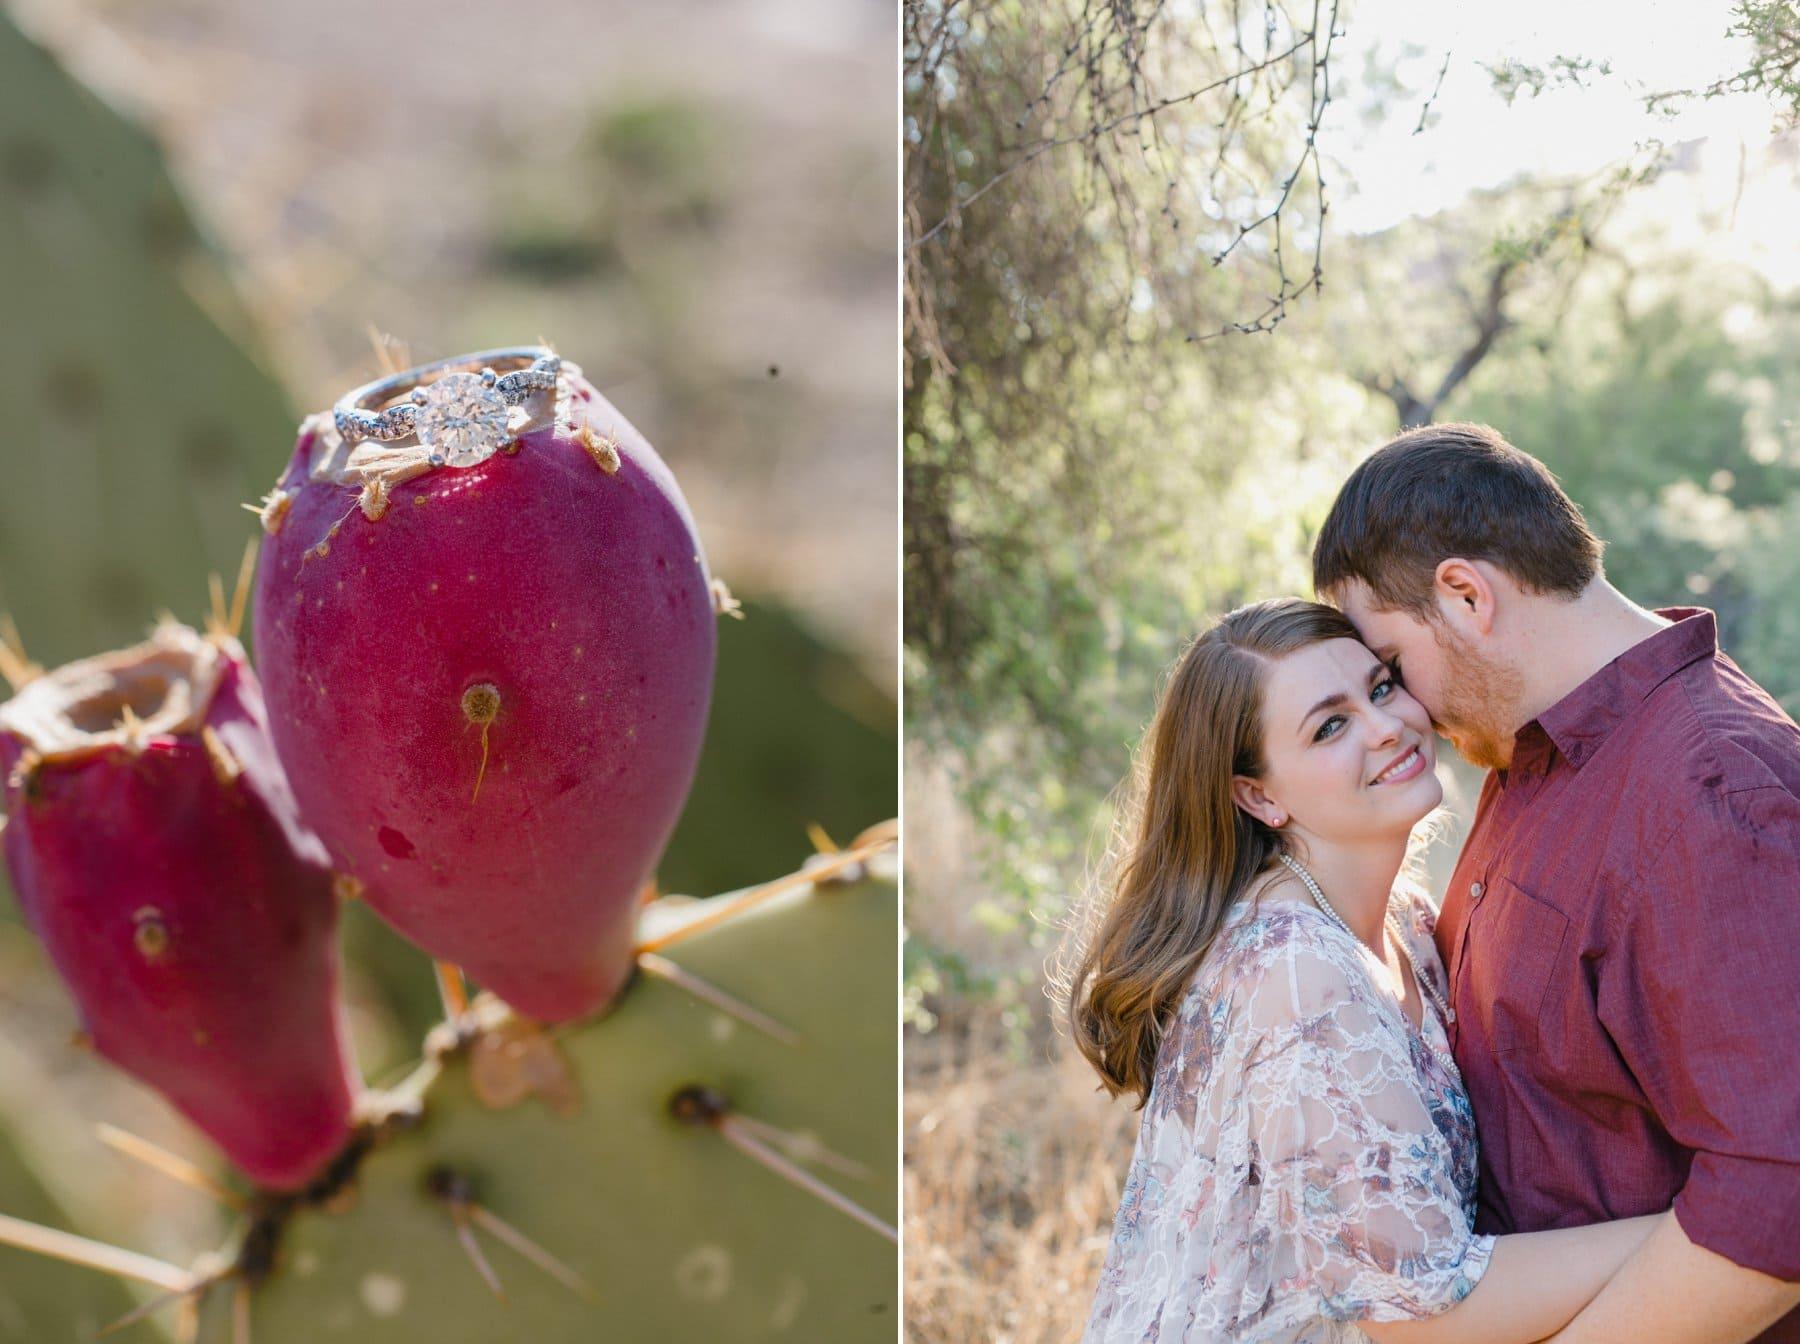 Salt River engagement photos